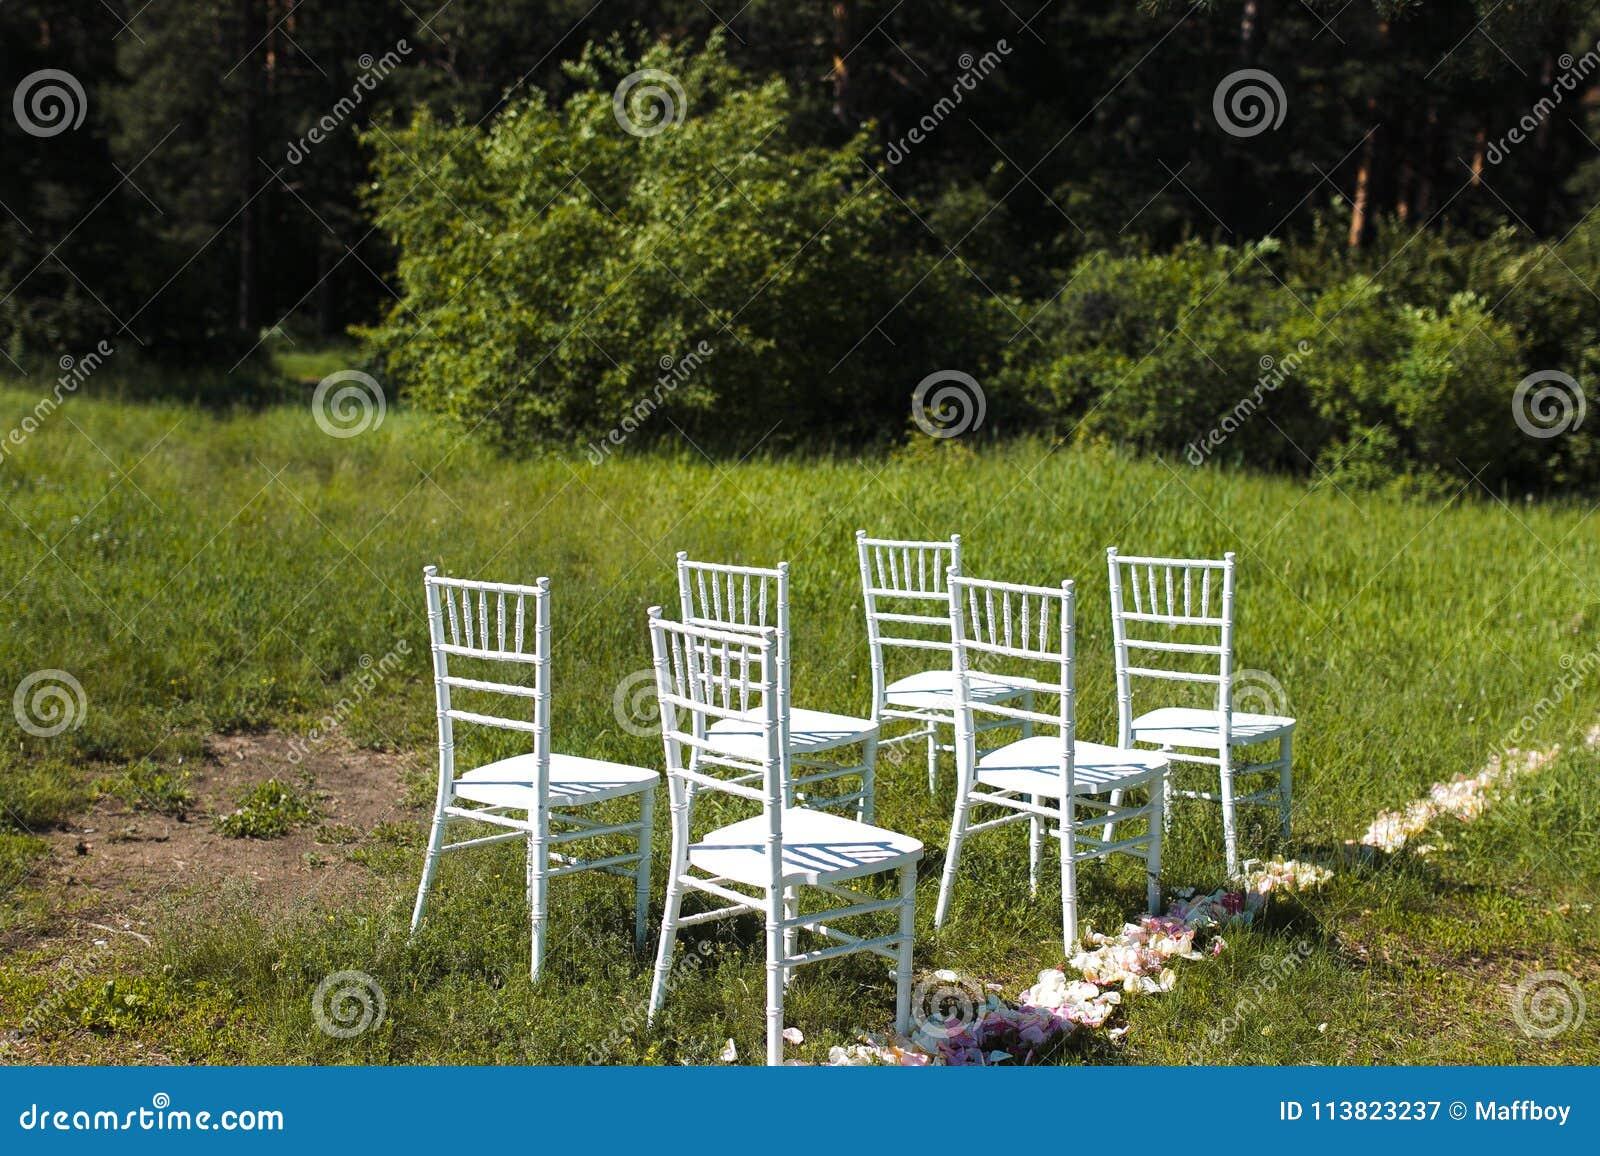 Chairs on wedding ceremony